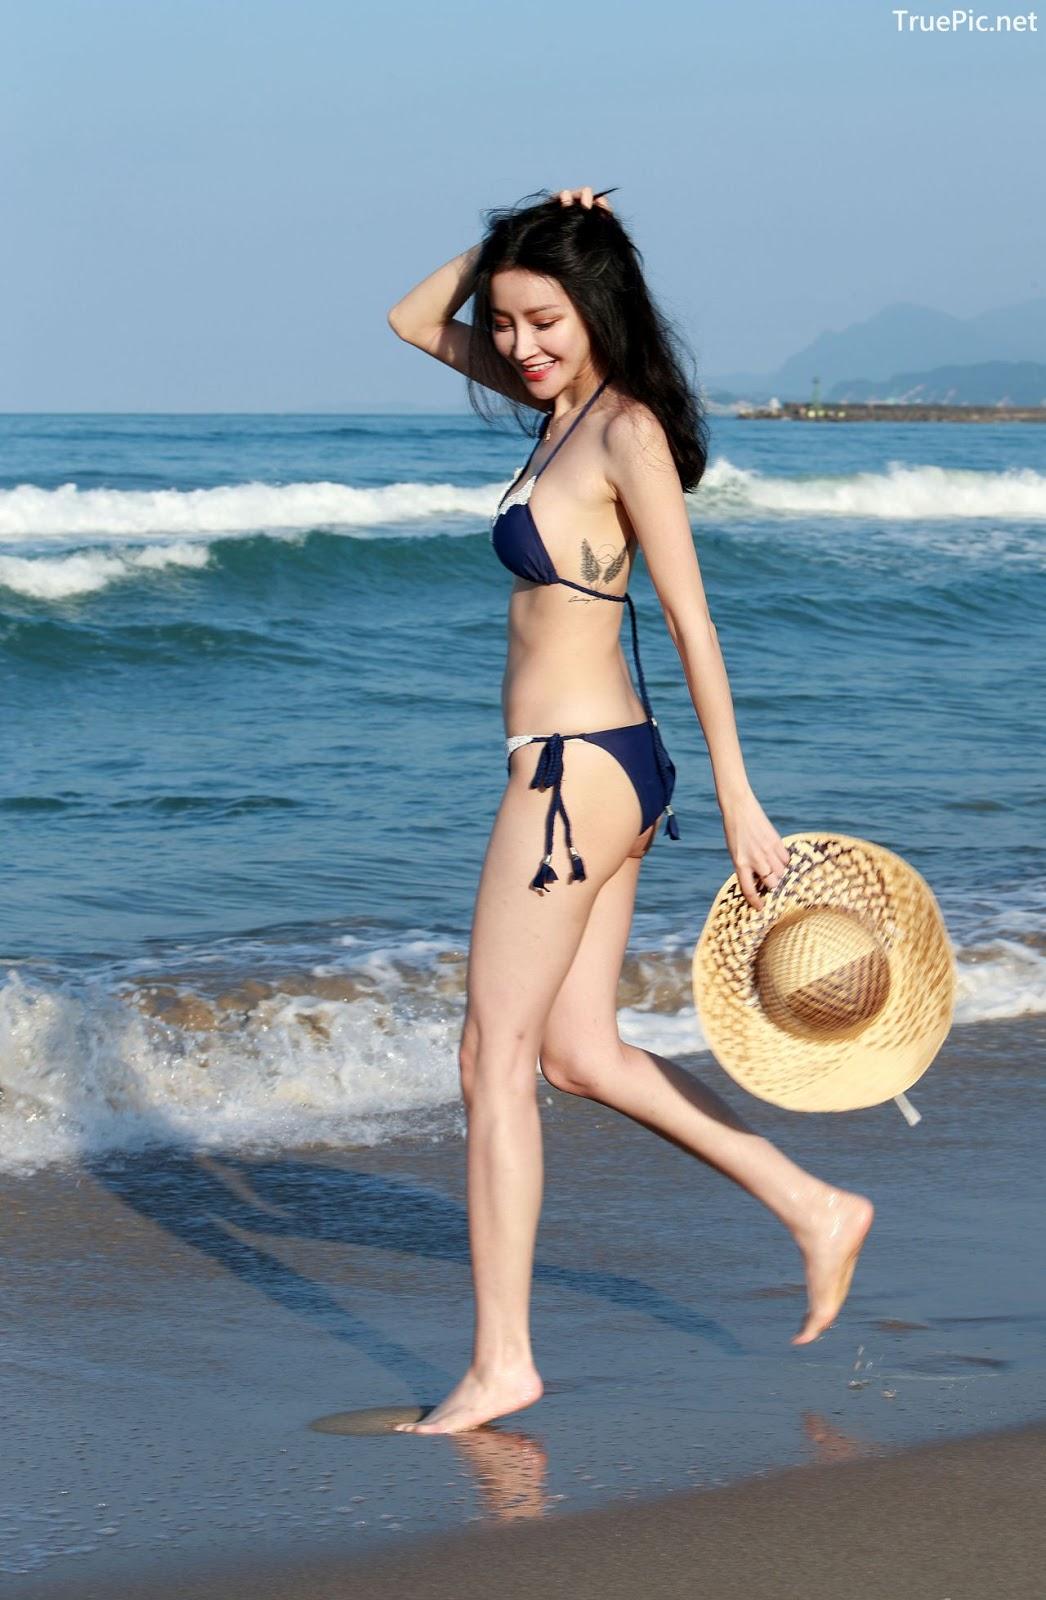 Image-Taiwanese-Model-艾薉-Beautiful-And-Sexy-Bikini-Girl-TruePic.net- Picture-3